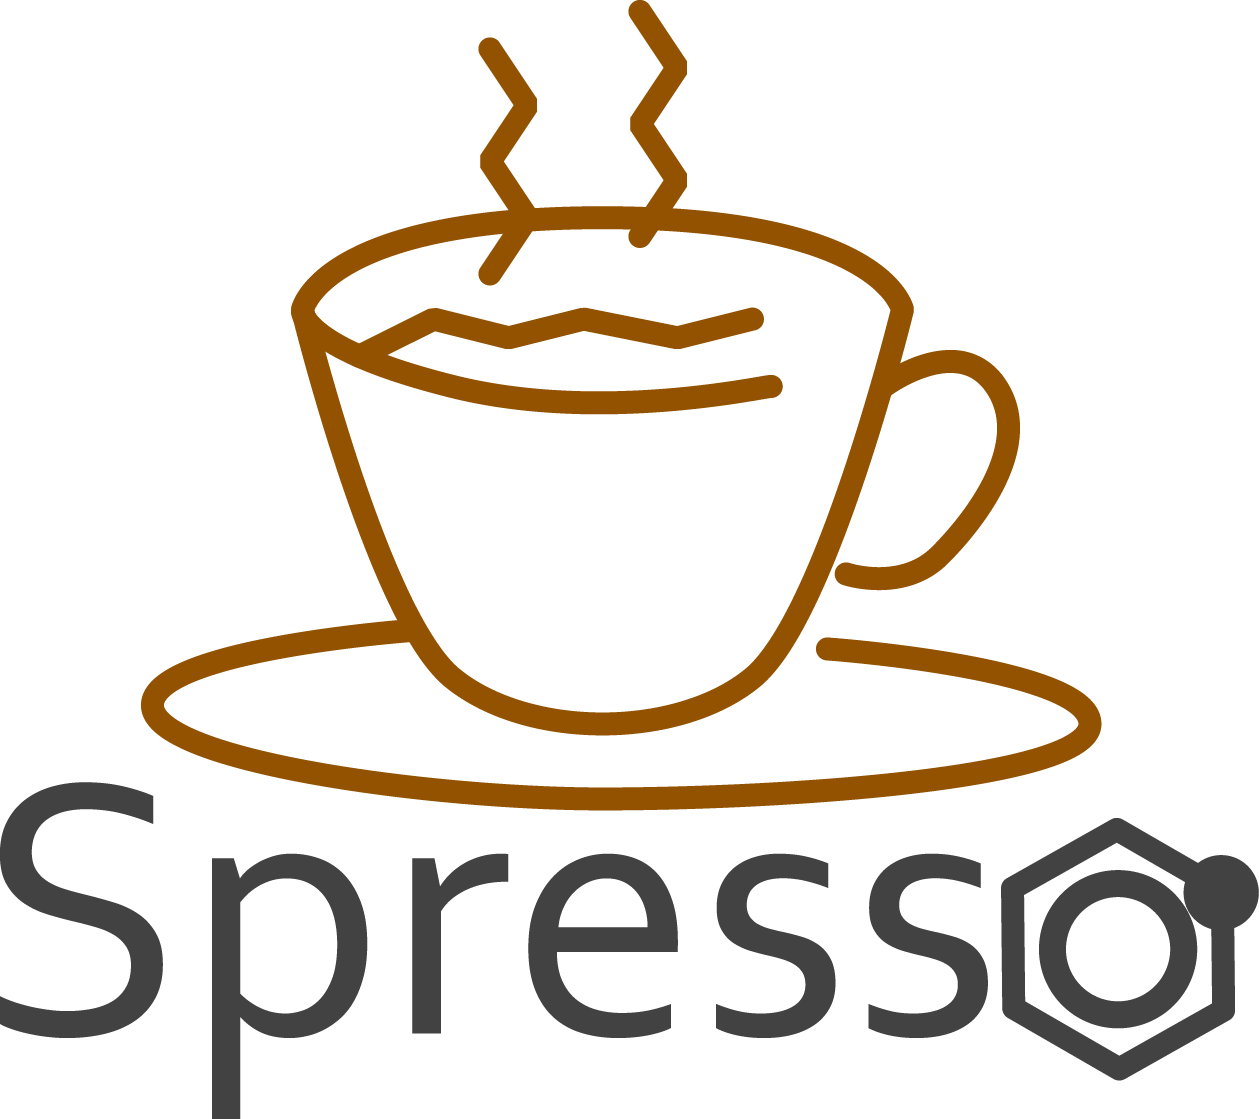 spresso_logo.png